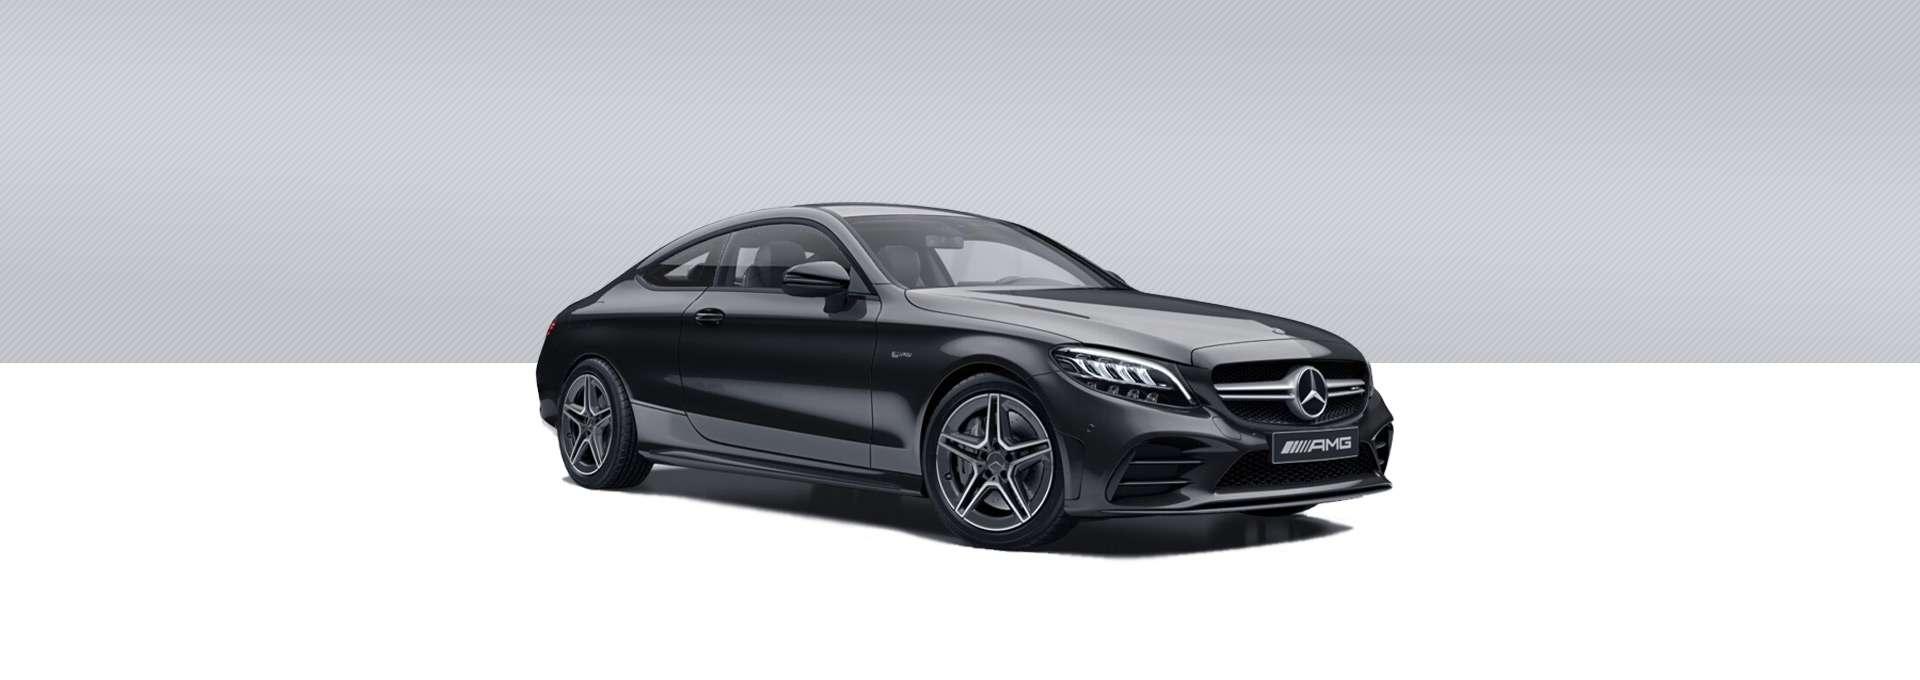 Mercedes Benz AMG CLASE C COUPÉ